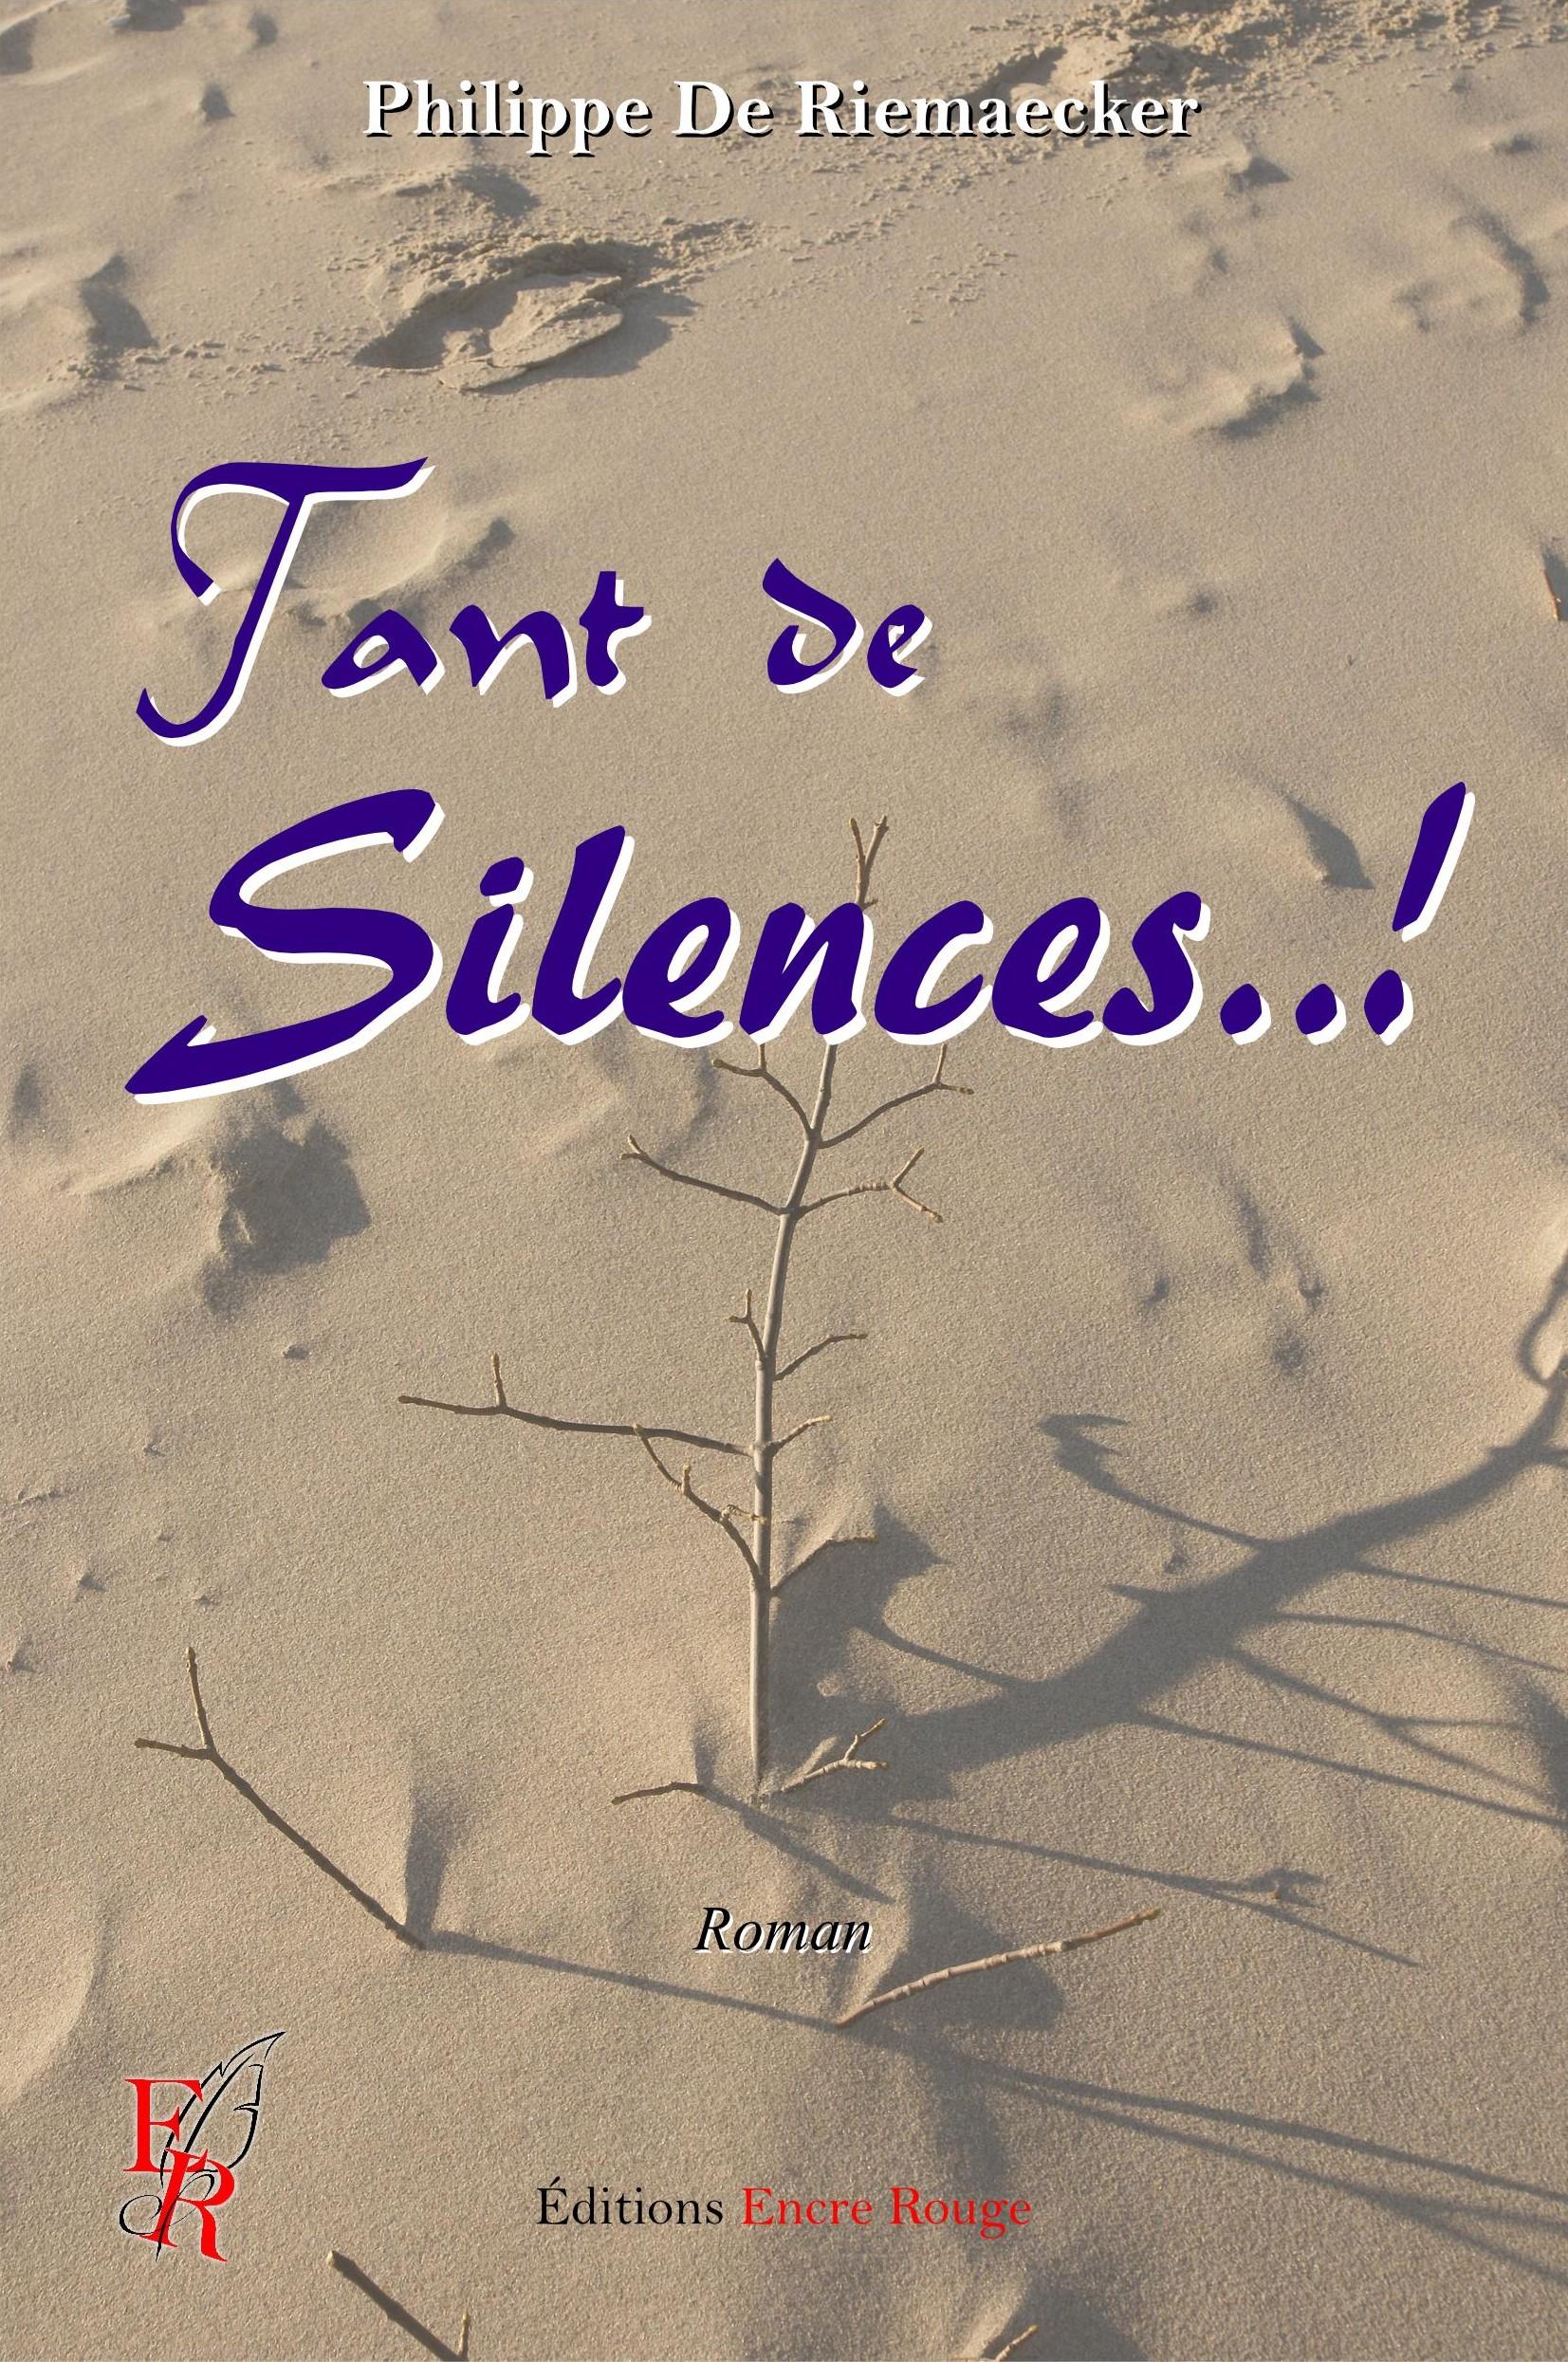 Tant de Silences..!, Roman universel